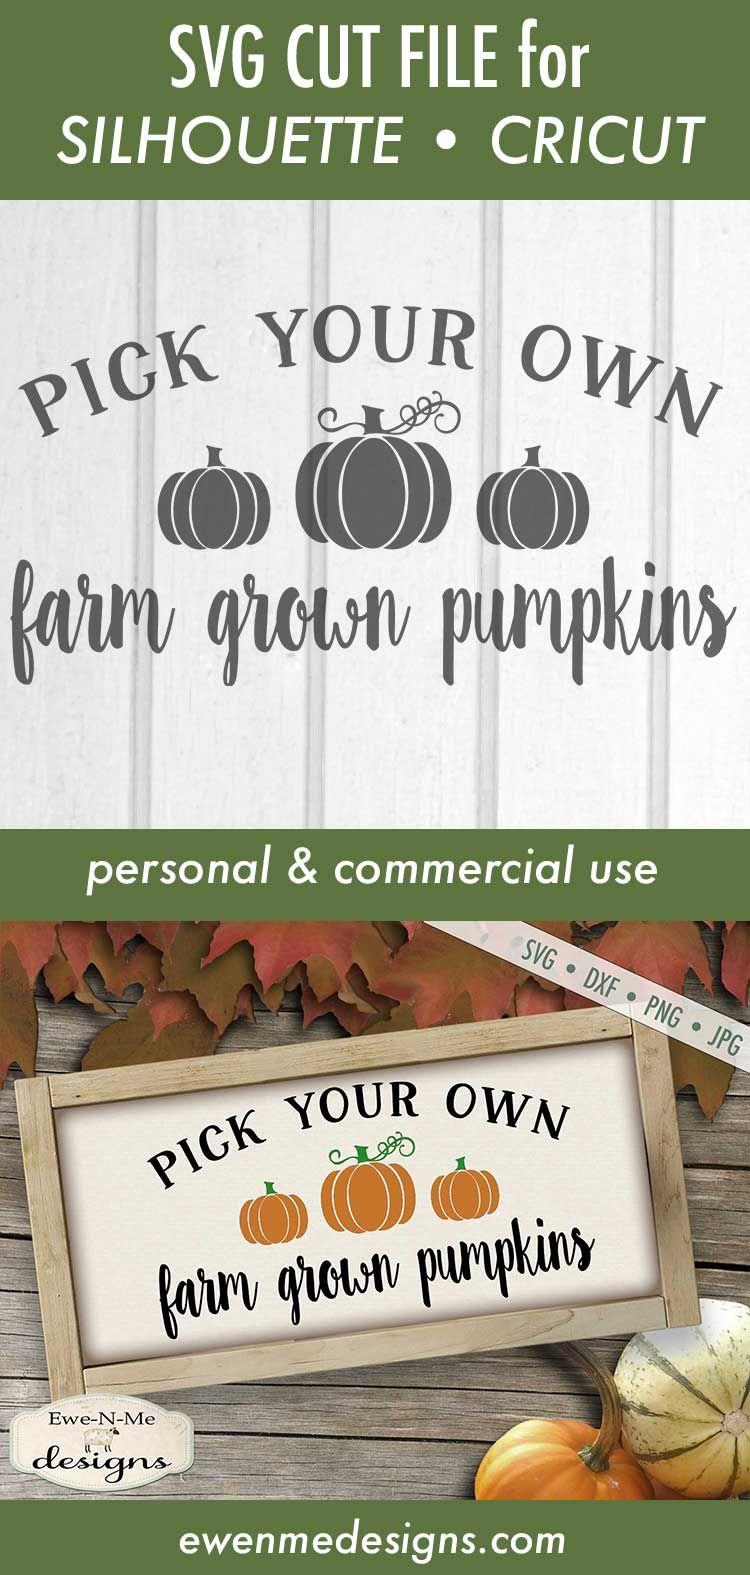 Pick Your Own Farm Grown Pumpkins Svg Dxf Files Pumpkin Farm Cricut Svg Files For Cricut